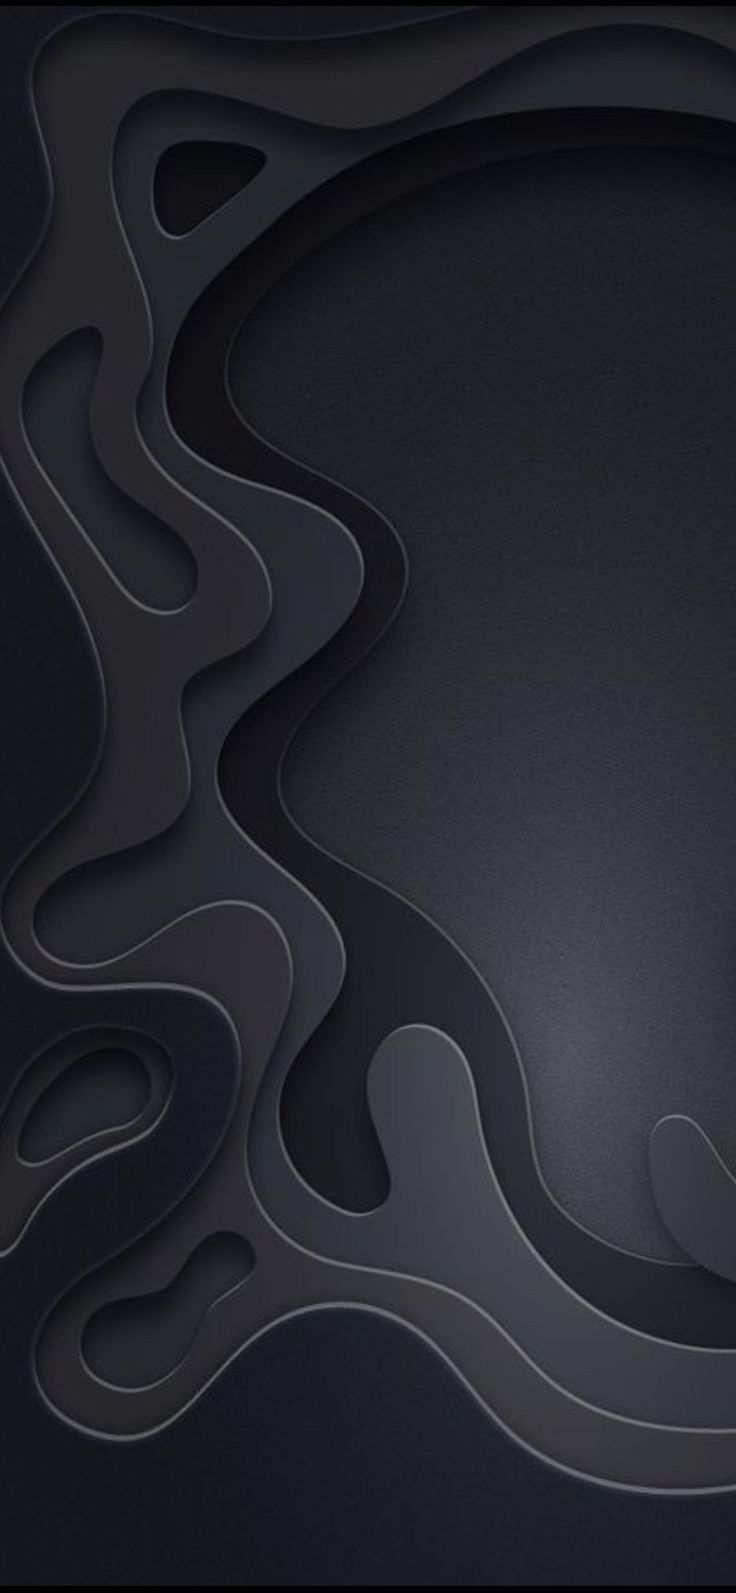 Iphone X Wallpaper Wallpaper Iphone X 364862007307118900 Dark Wallpaper Iphone Dark Wallpaper Oneplus Wallpapers